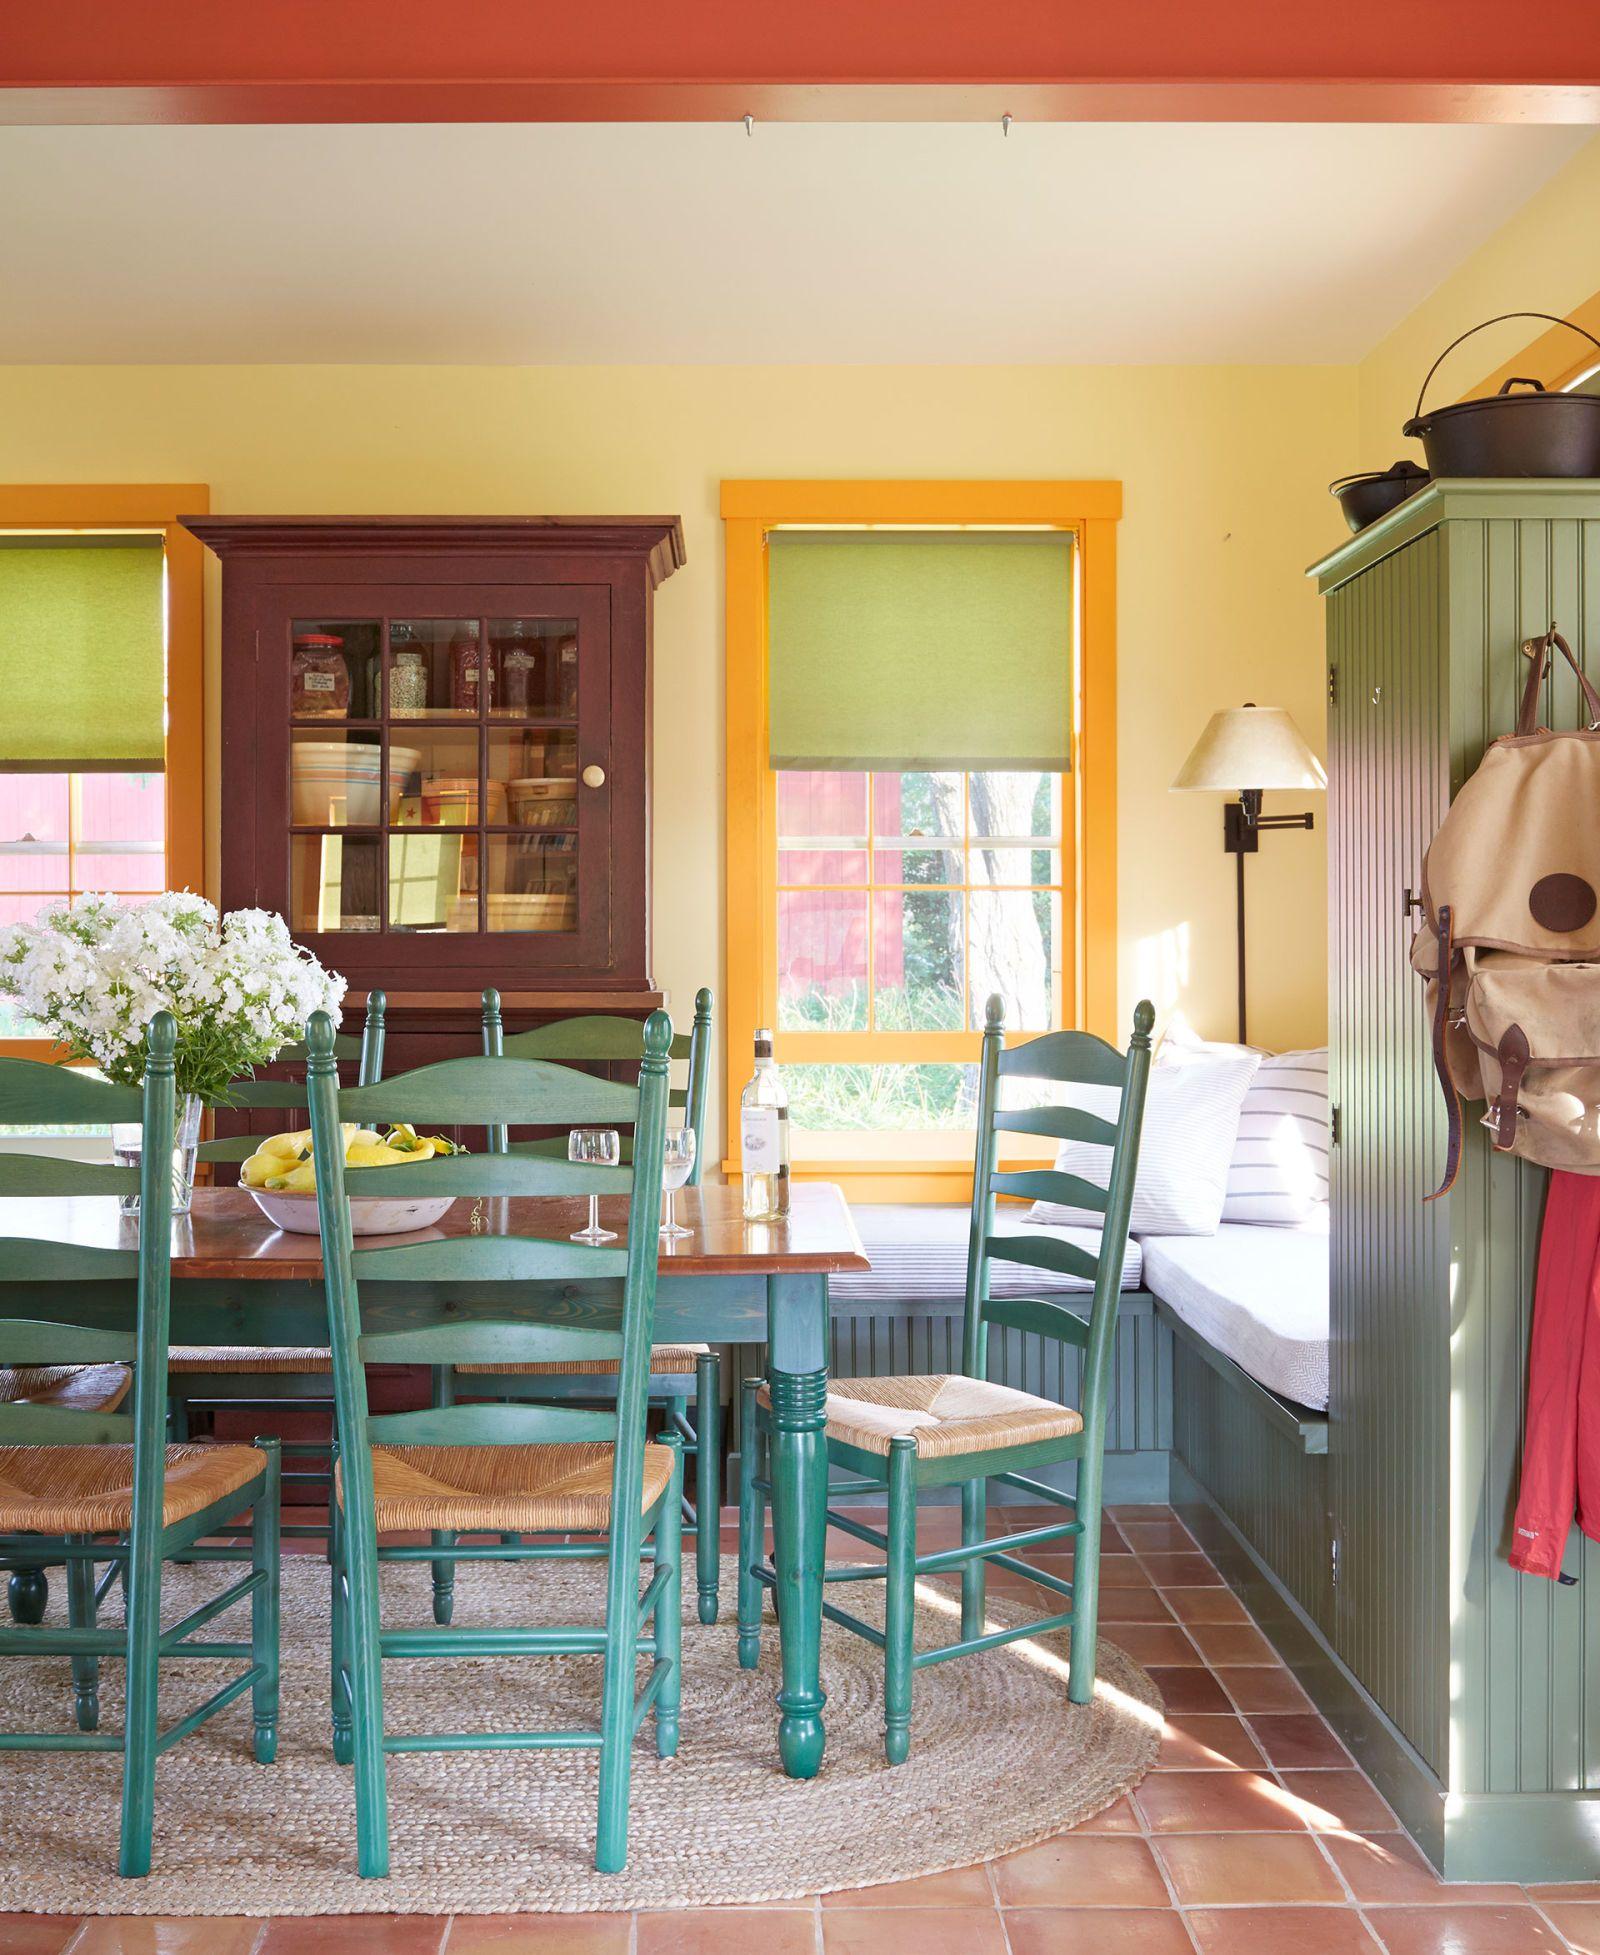 Image. Max Kim Bee. Farmhouse Dining Room